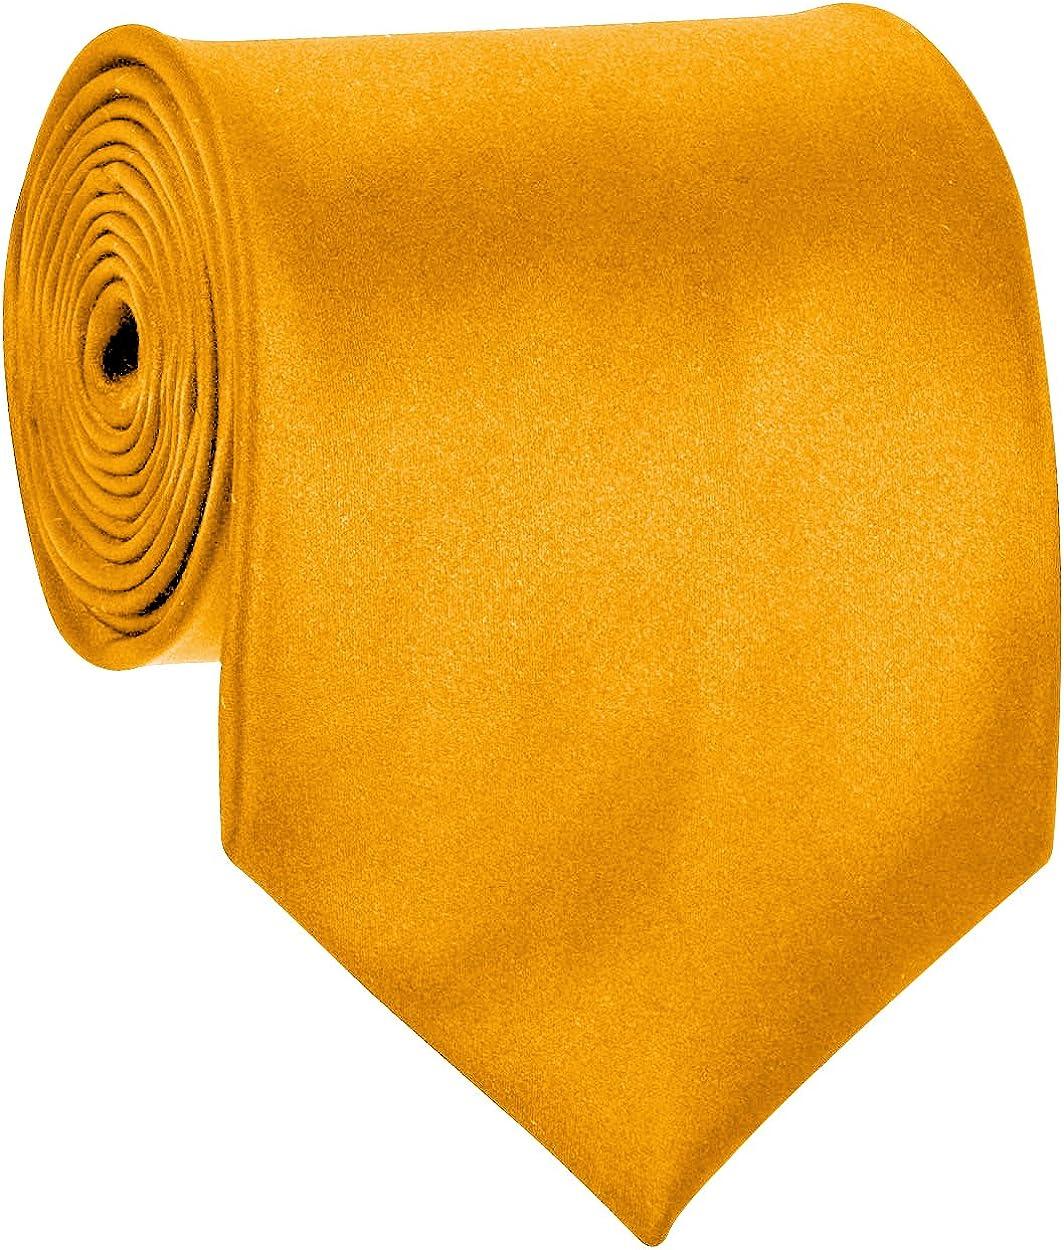 Mens Necktie SOLID Satin Sale item Golden Neck Cheap mail order specialty store Yellow Tie